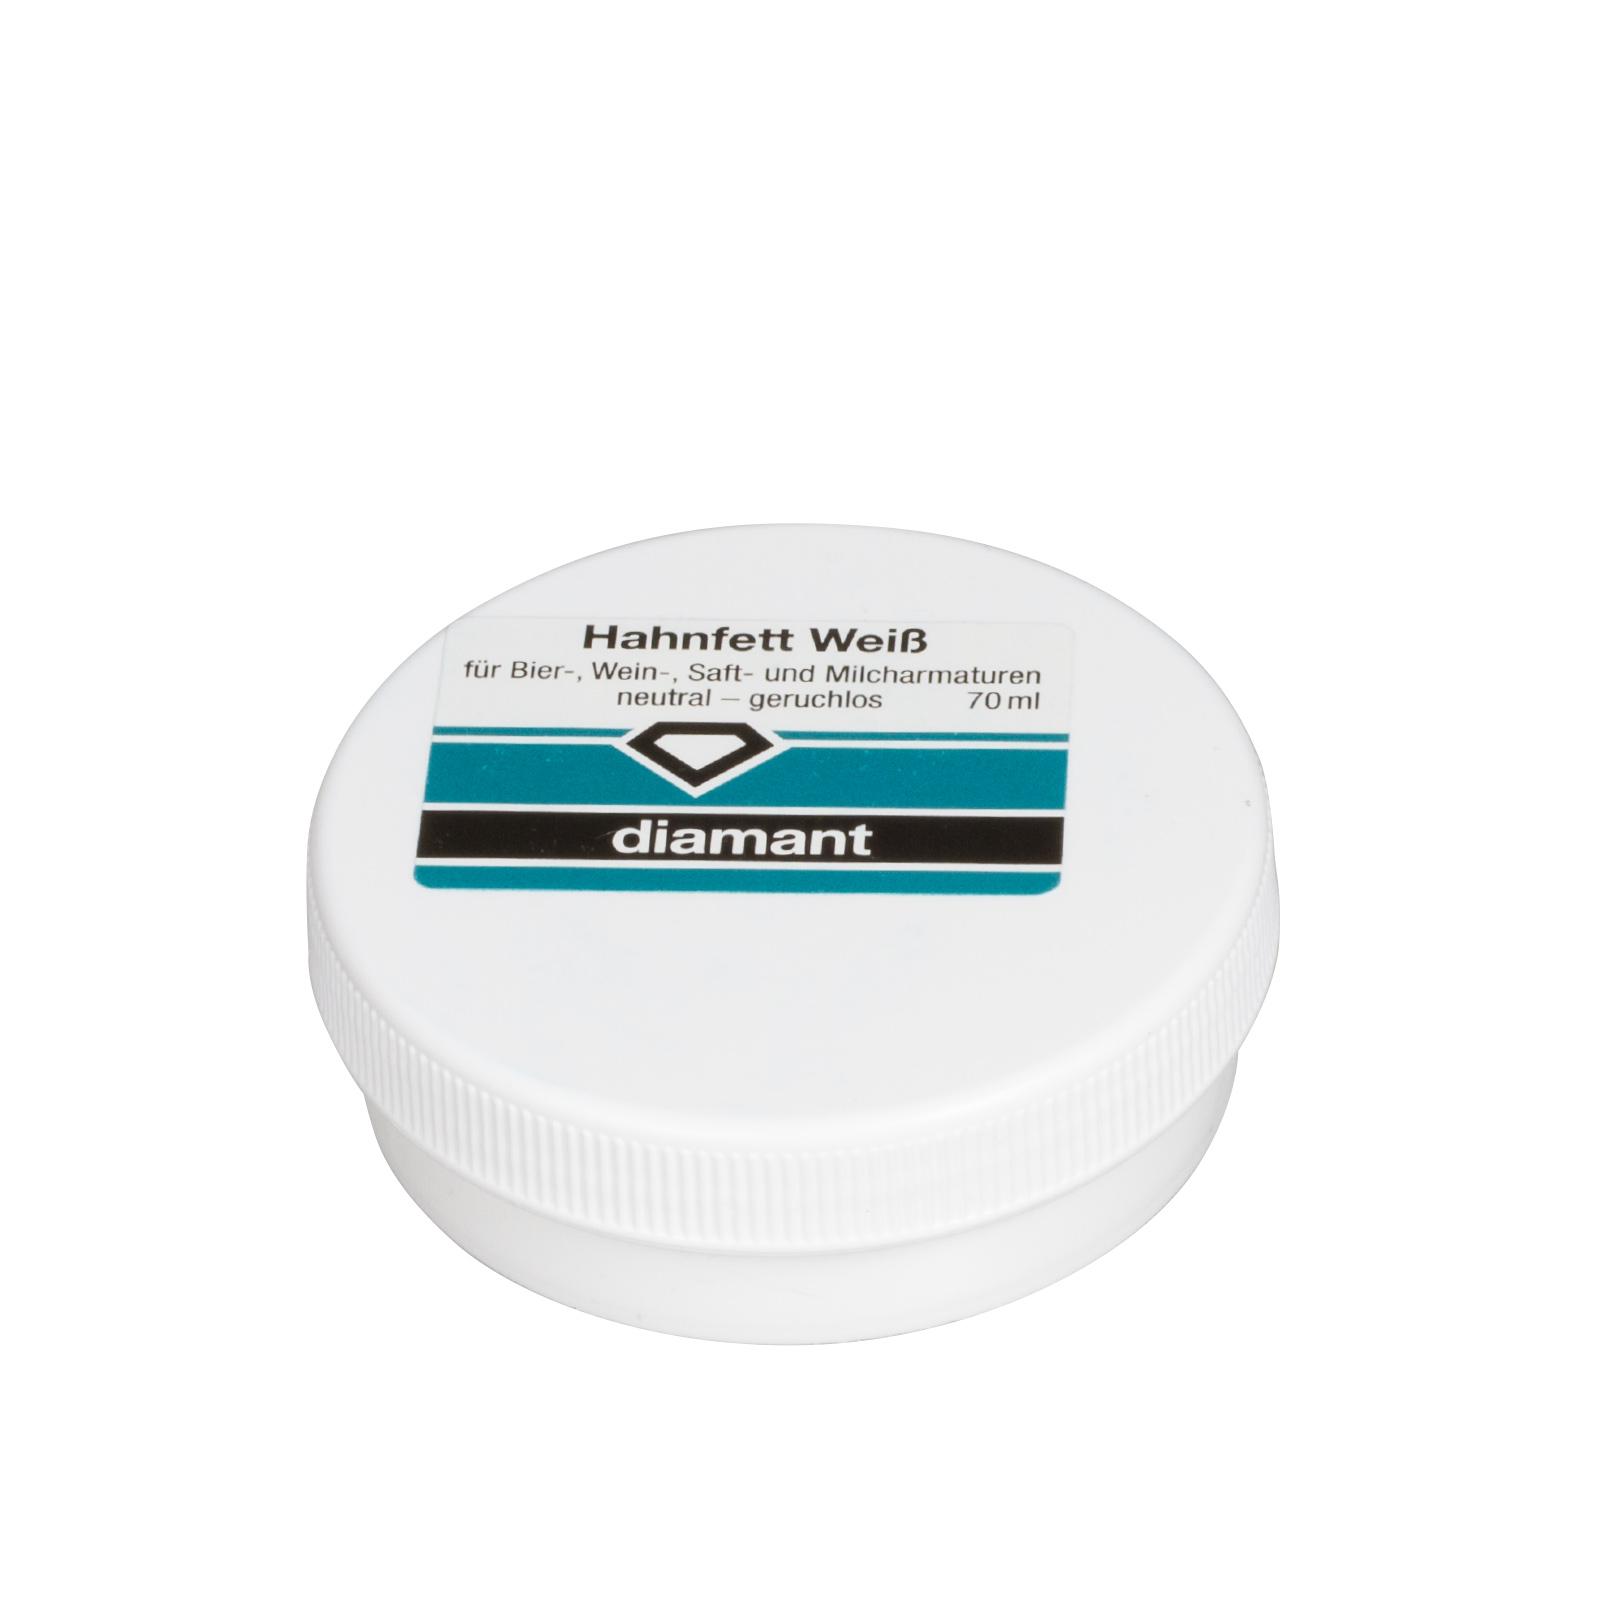 Potravinářská vazelina Diamant 70 ml